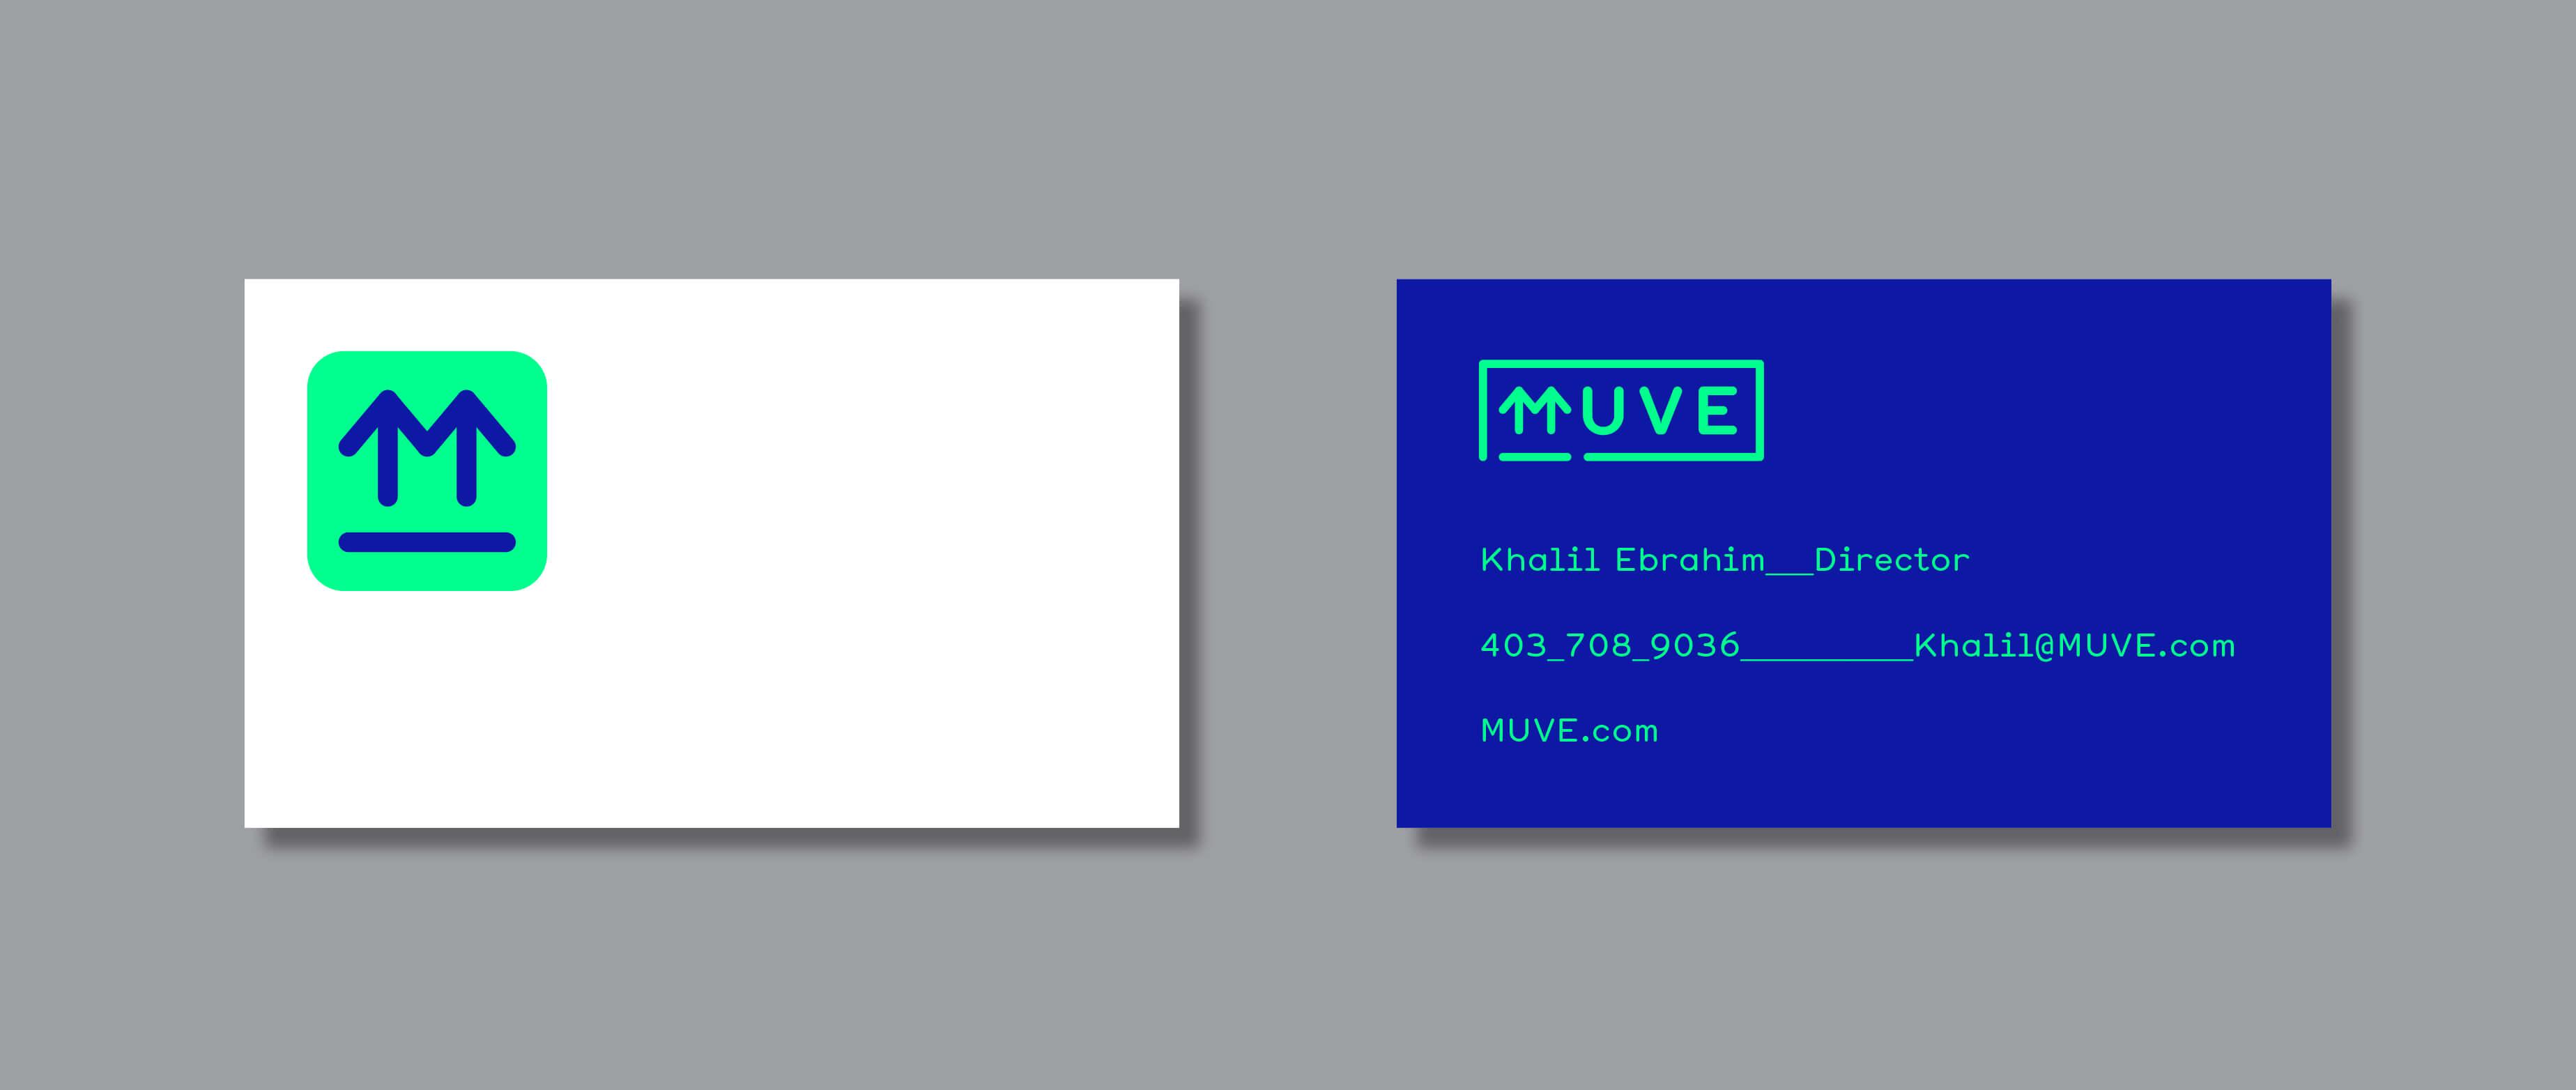 MUVE-branding-2_Mustaali.jpg